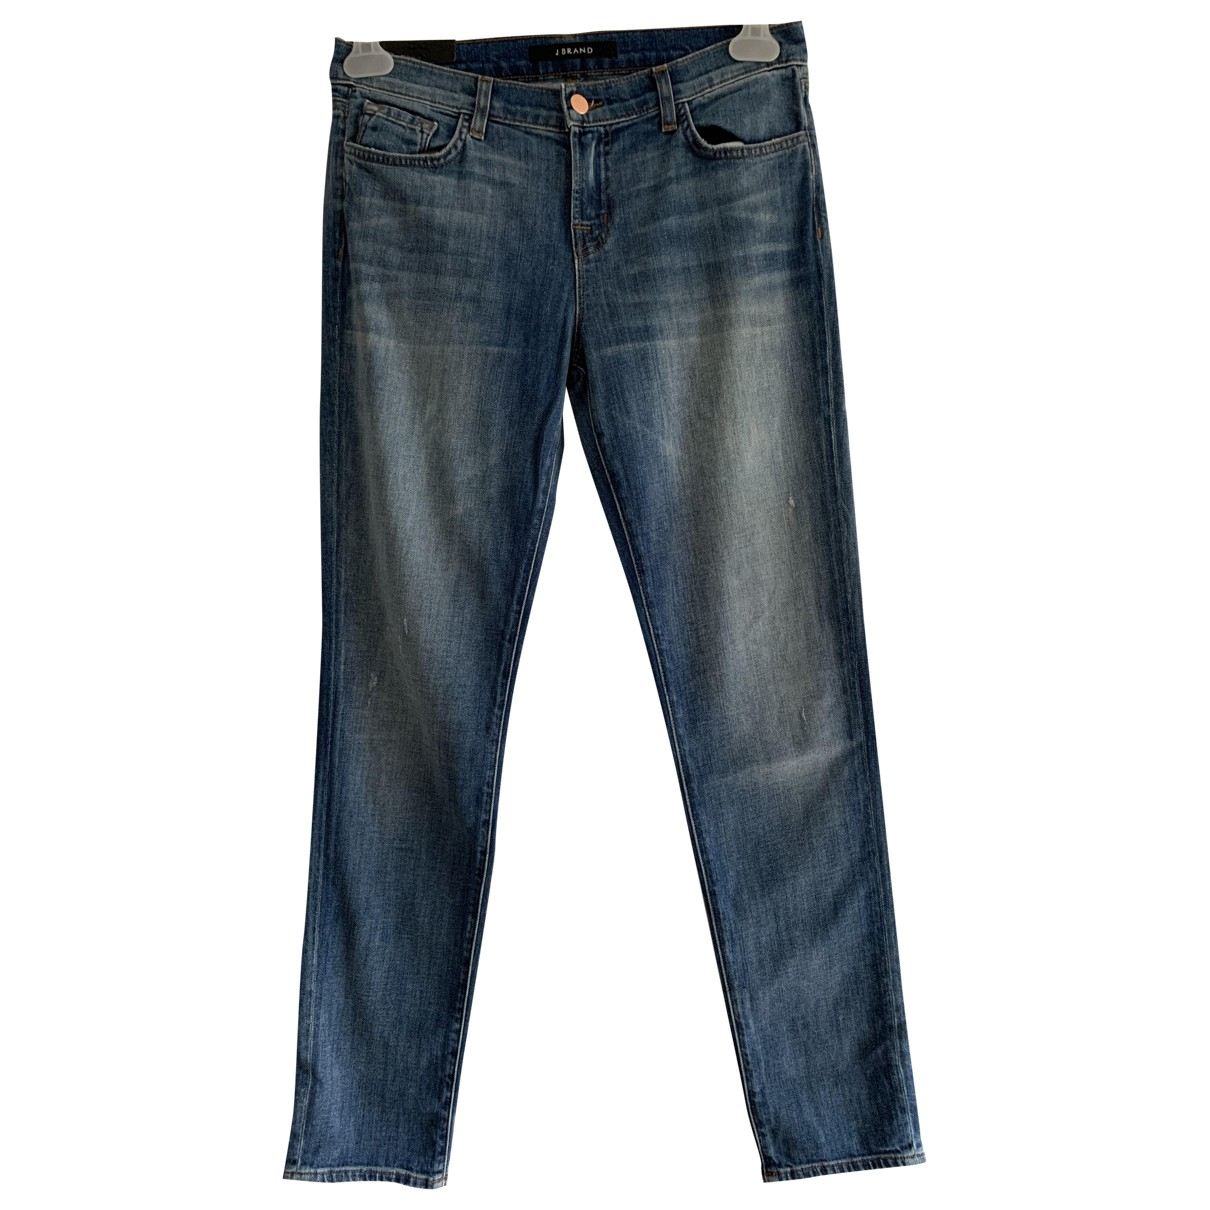 J Brand \N Blue Cotton - elasthane Jeans for Women 26 US